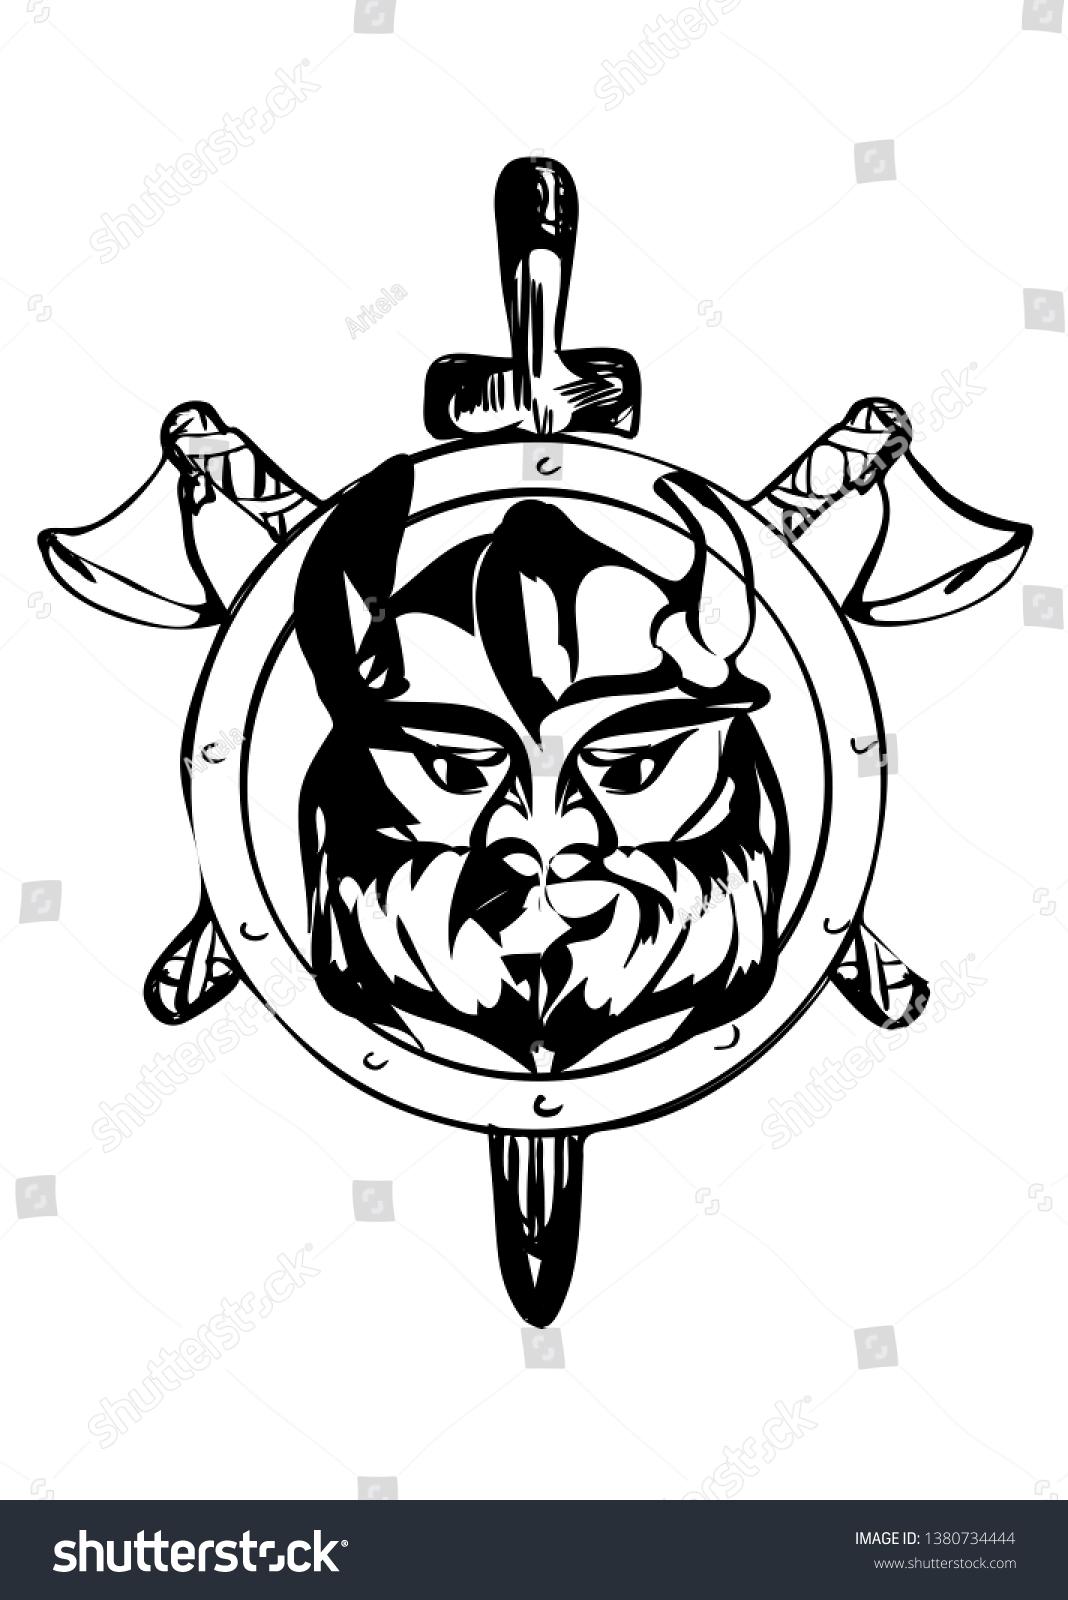 Viking Helmet Silhouette : viking, helmet, silhouette, Viking, Silhouette, Horned, Helmet, White, Stock, Vector, (Royalty, Free), 1380734444